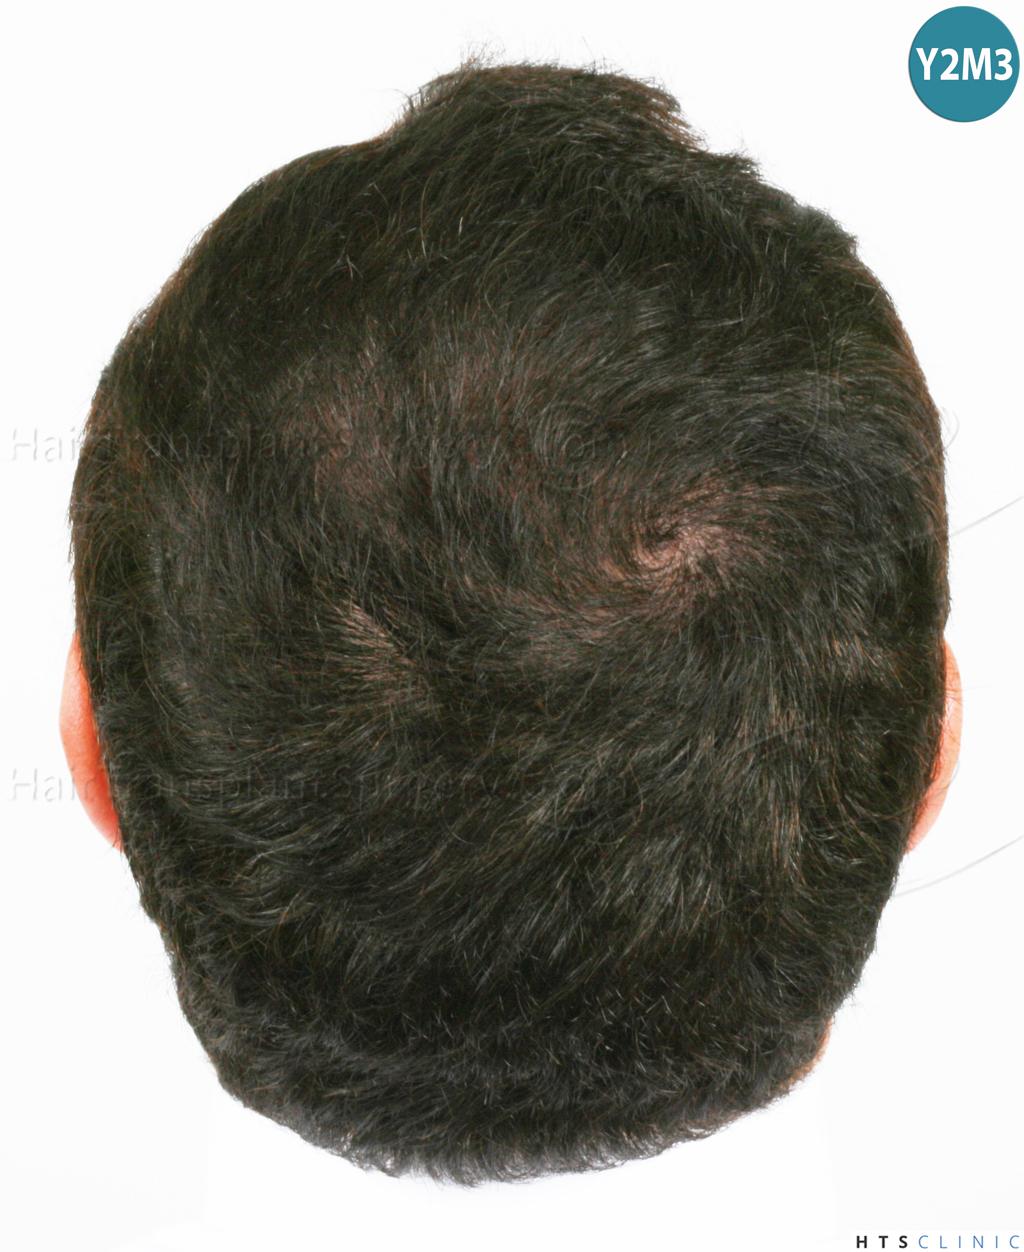 Dr.Devroye-HTS-Clinic-983-FUT-Vertex-15.jpg